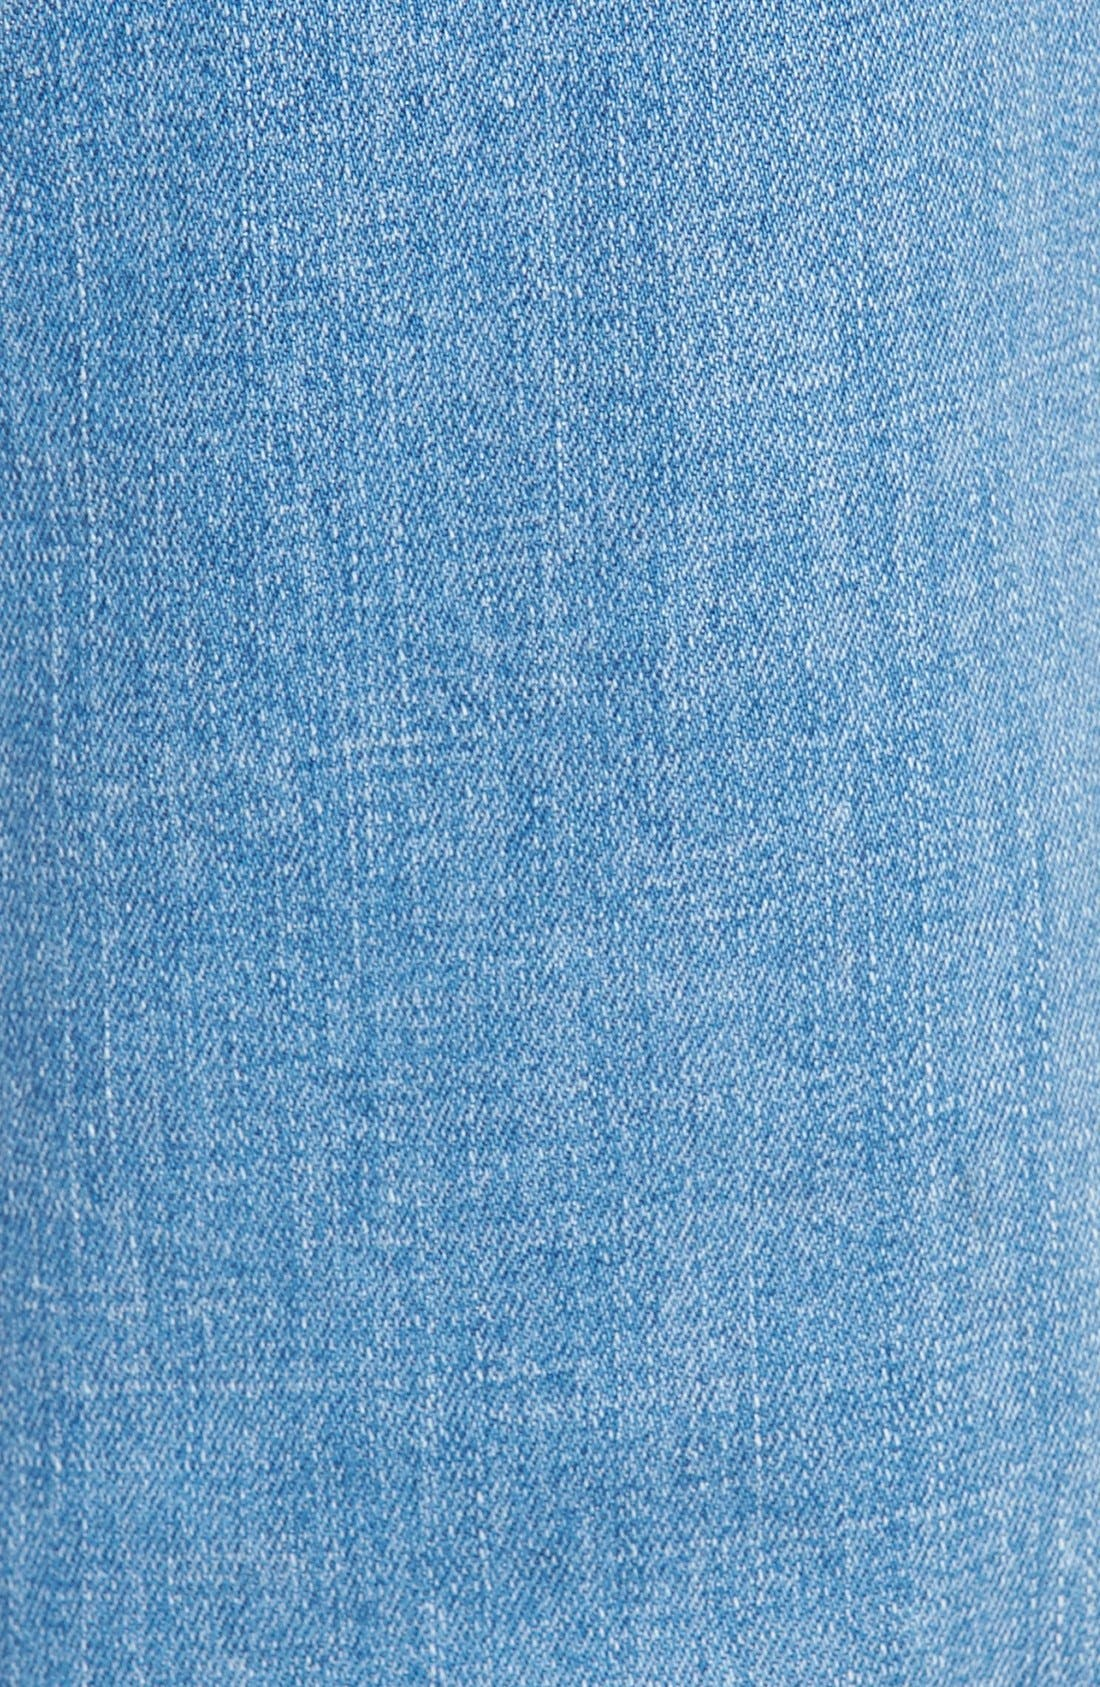 Alternate Image 5  - 7 For All Mankind® 'Josefina' Mid Rise Boyfriend Jeans (Mediterranean Sky)